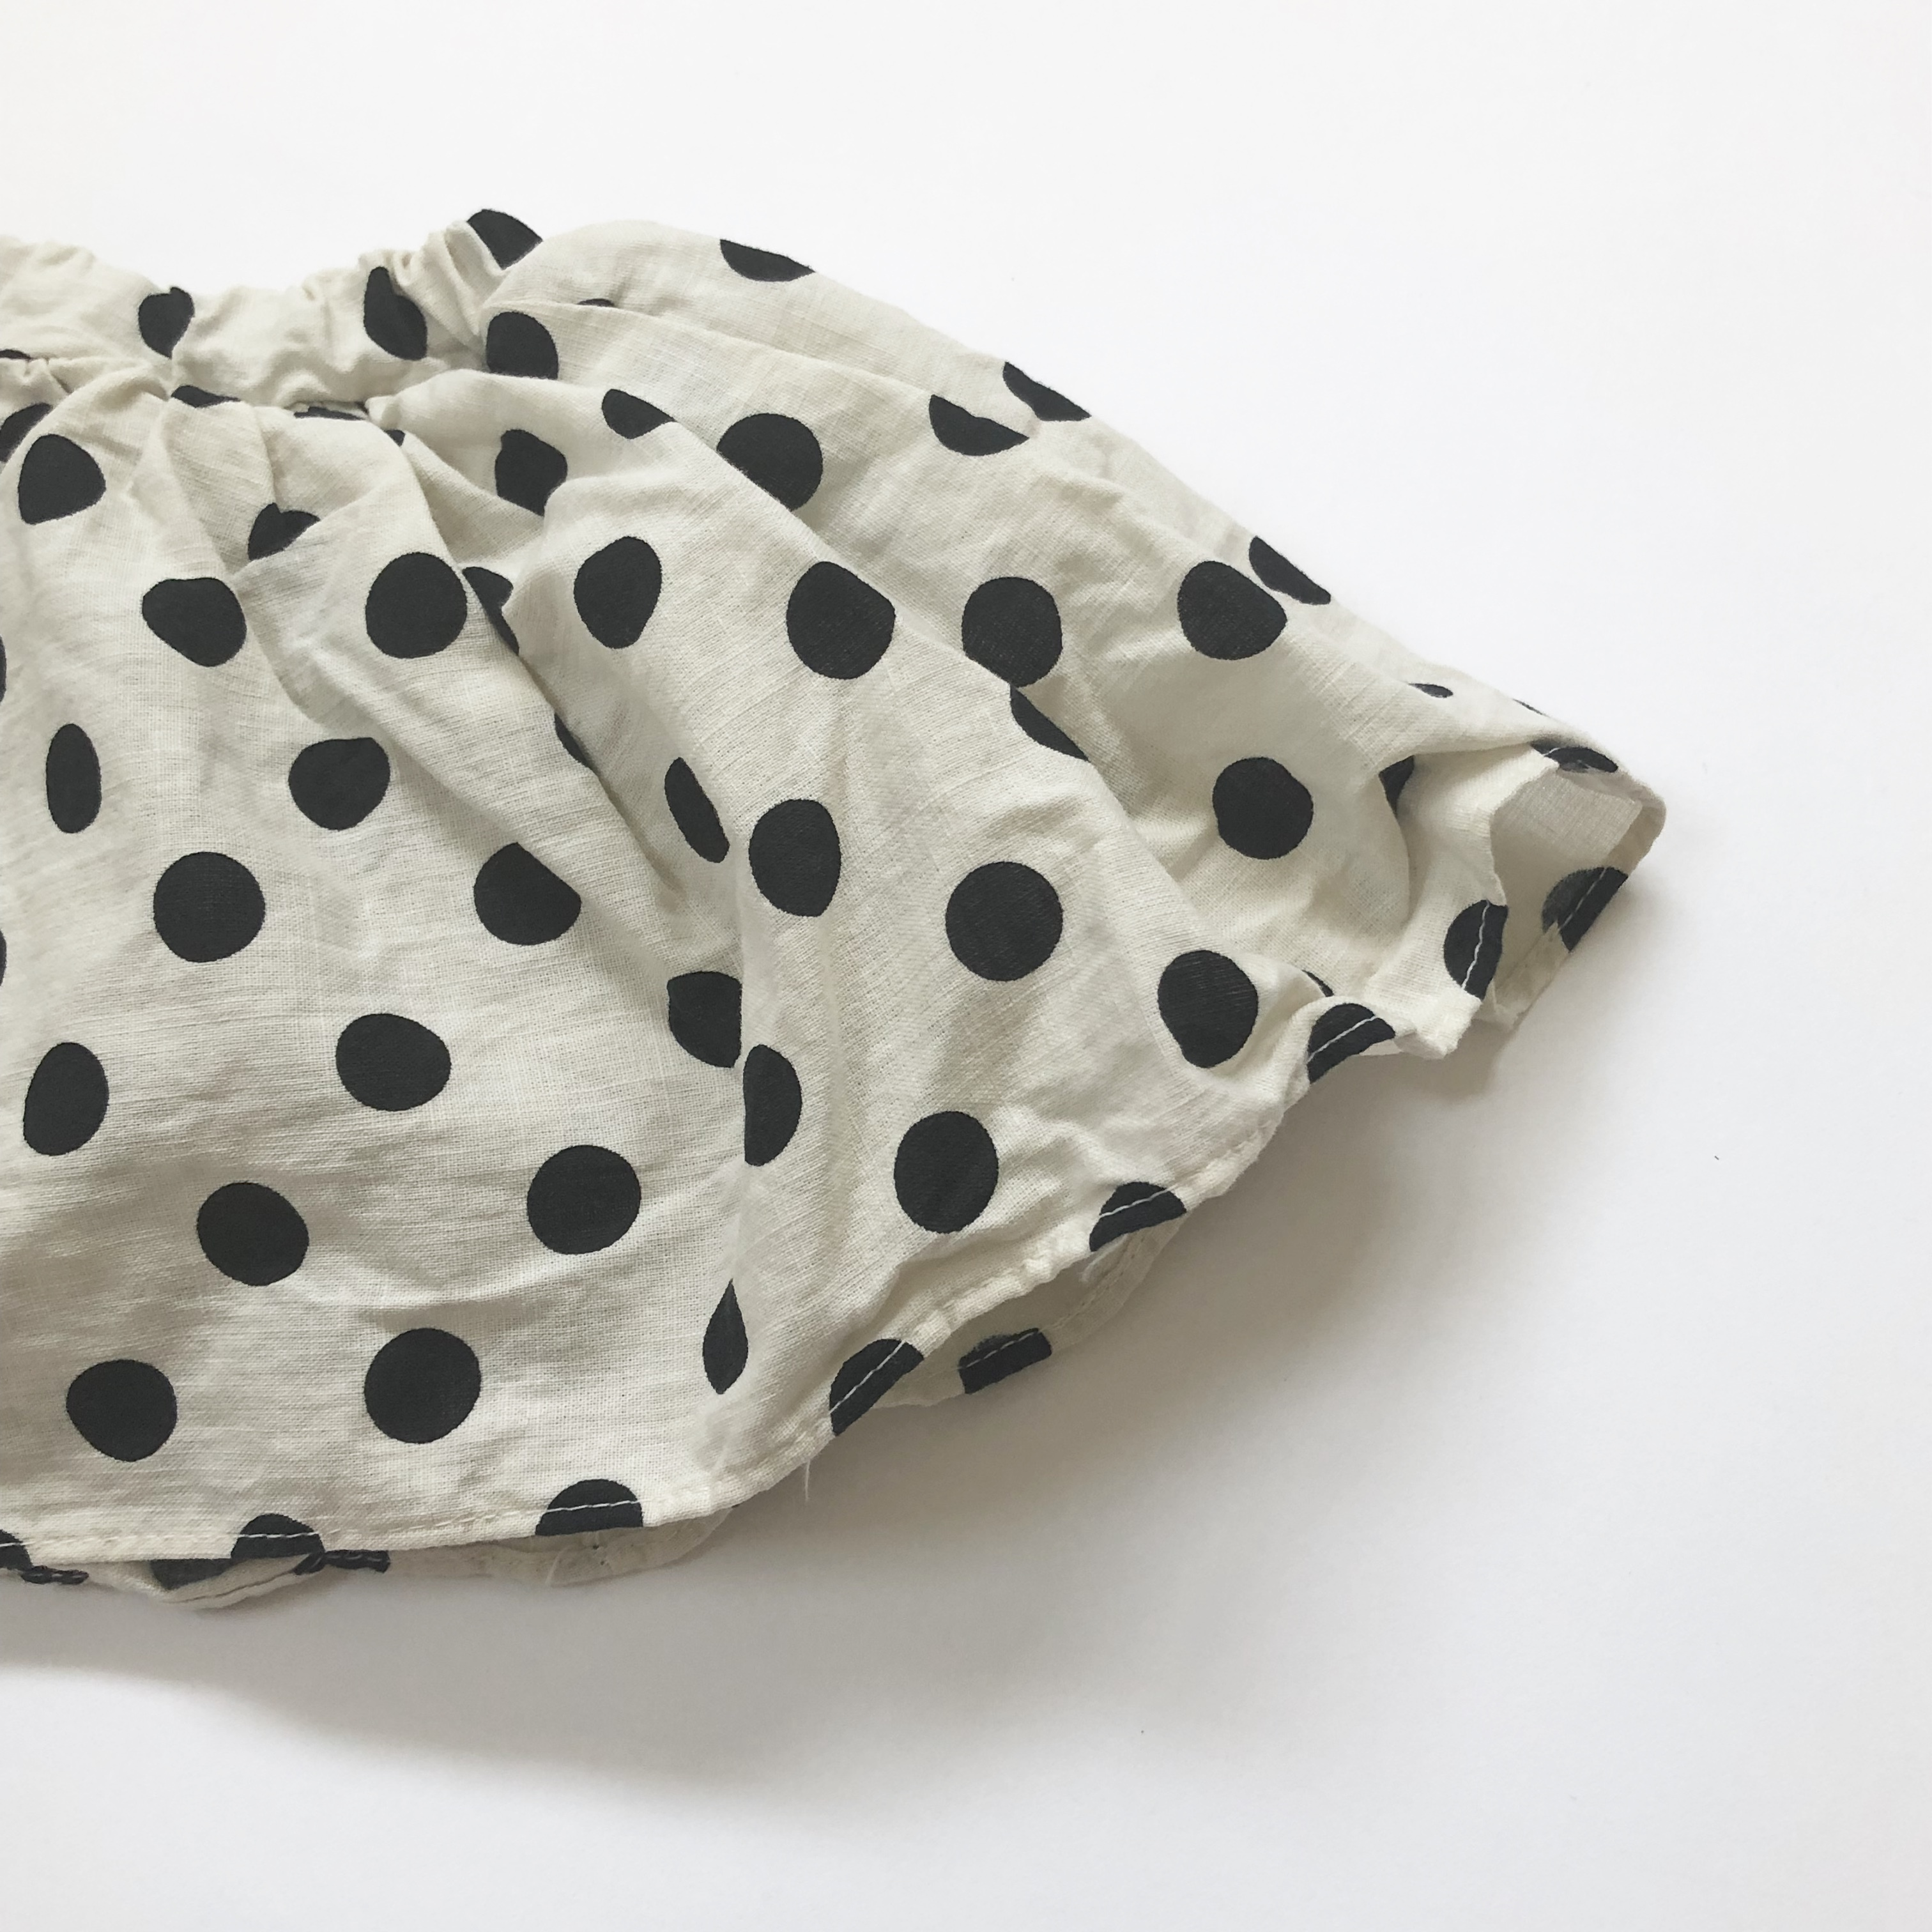 〈 211 〉skirt bloomers